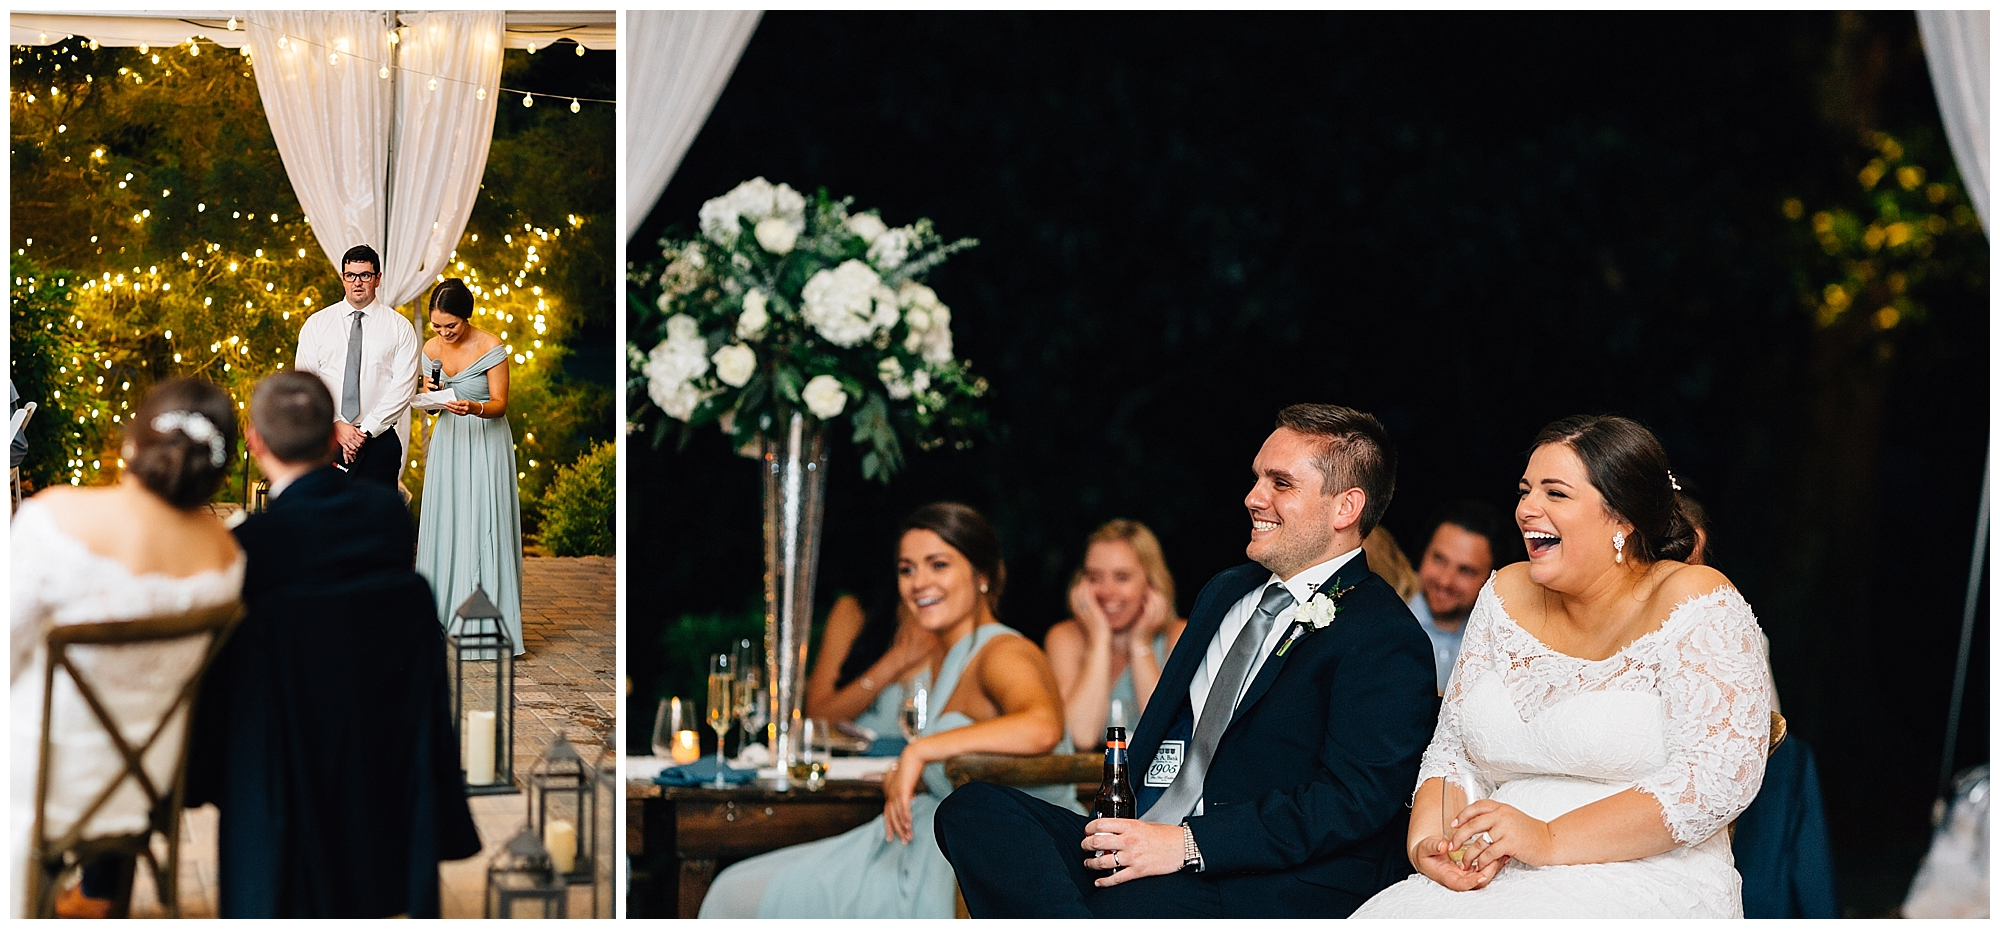 Oaks-at-salem-wedding-apex-photography-101.jpg